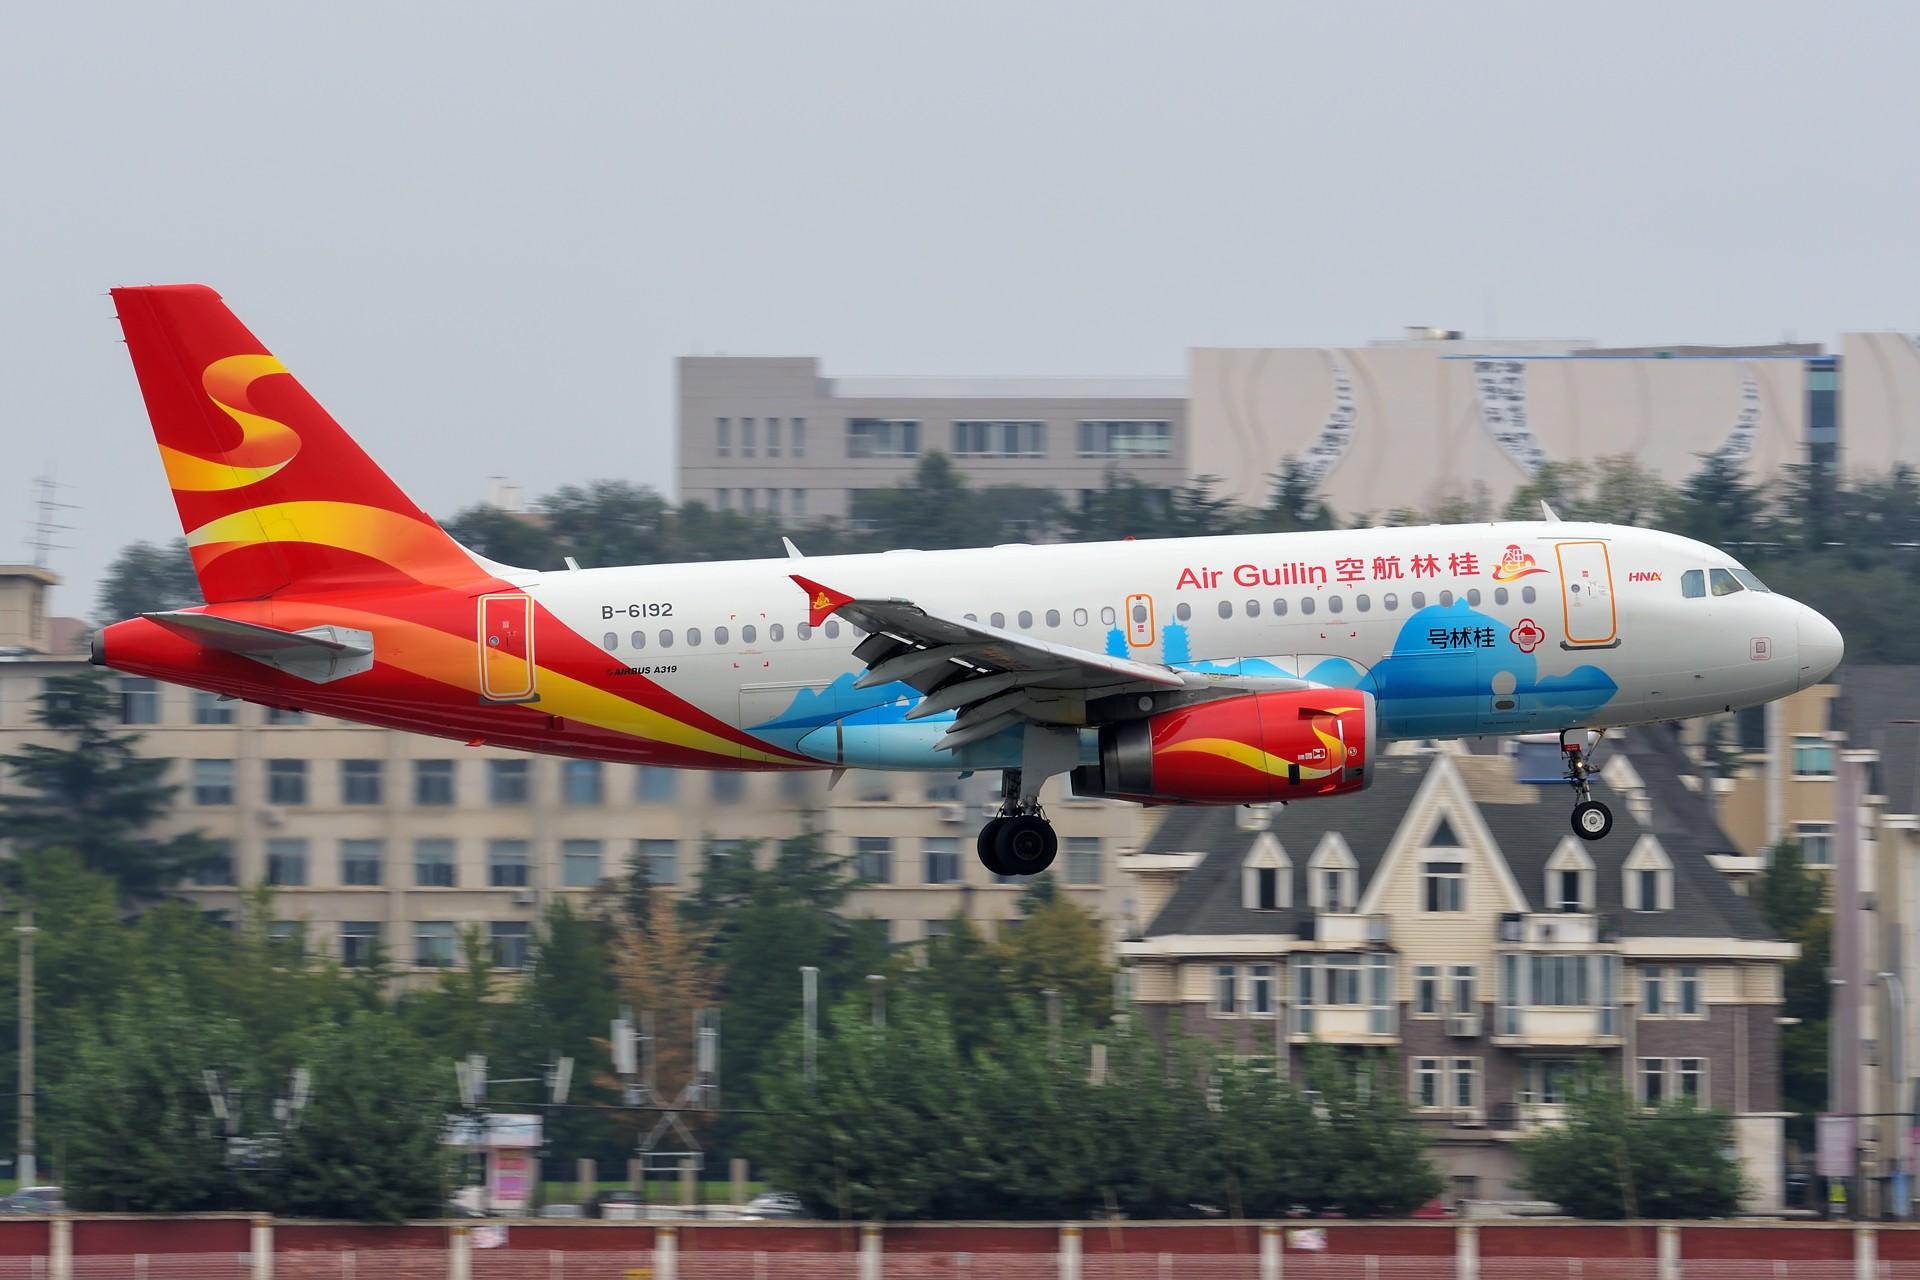 Re:[原创]★[DLC]一点有趣的事情(国庆加点儿料)★ AIRBUS A319-100 B-6192 中国大连国际机场